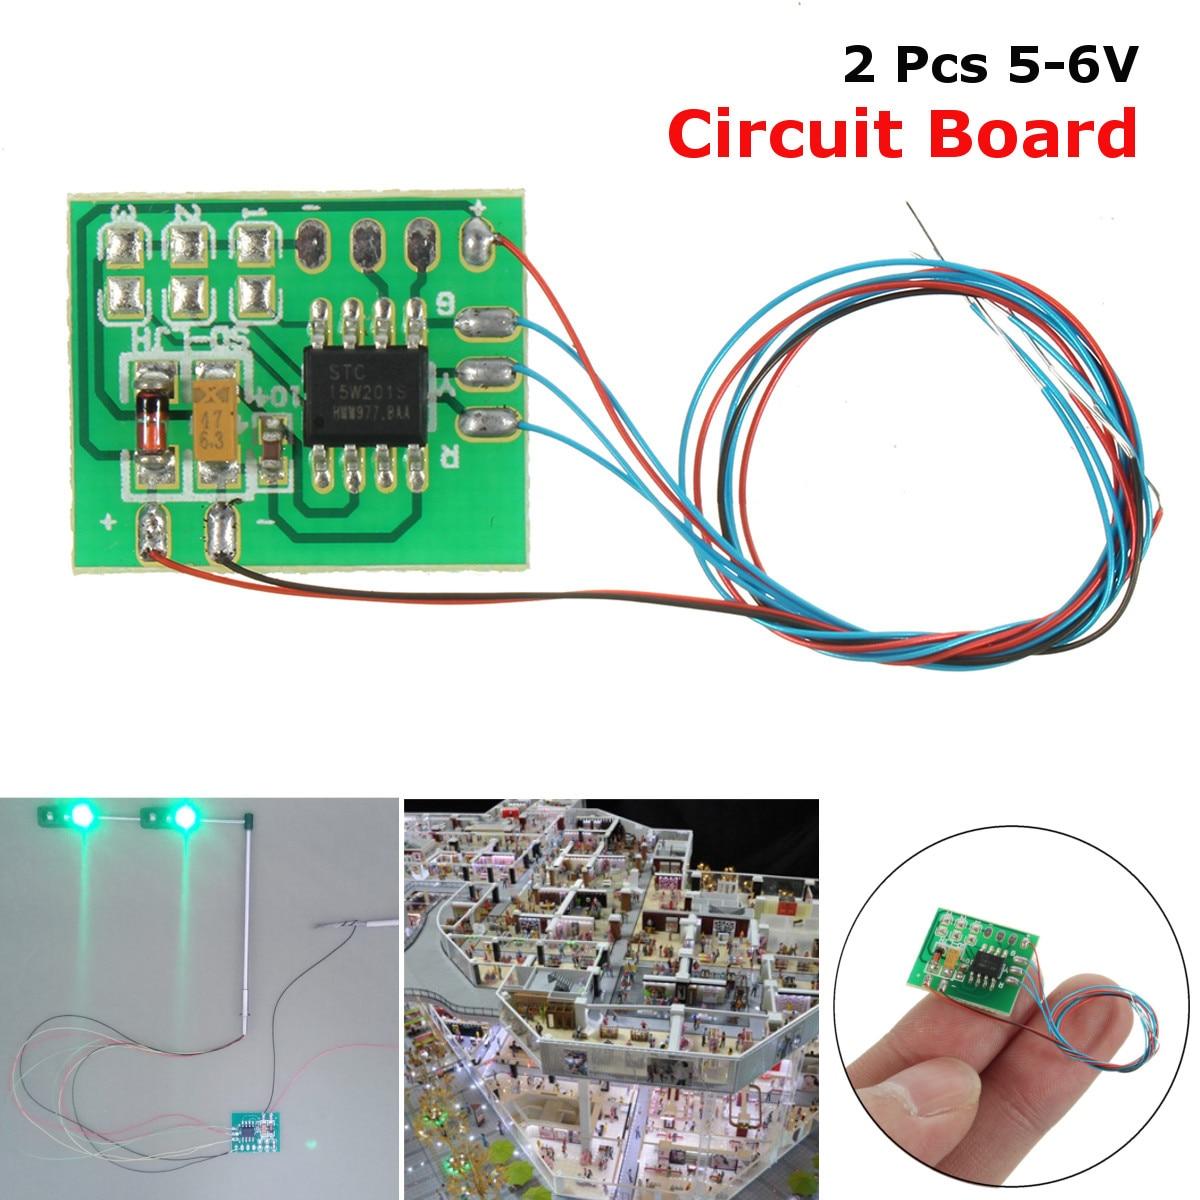 2Pcs DIY Scale Construction Sand Table Model Circuit Board Traffic Light Signal Model HO Scale Train Railway Miniatures